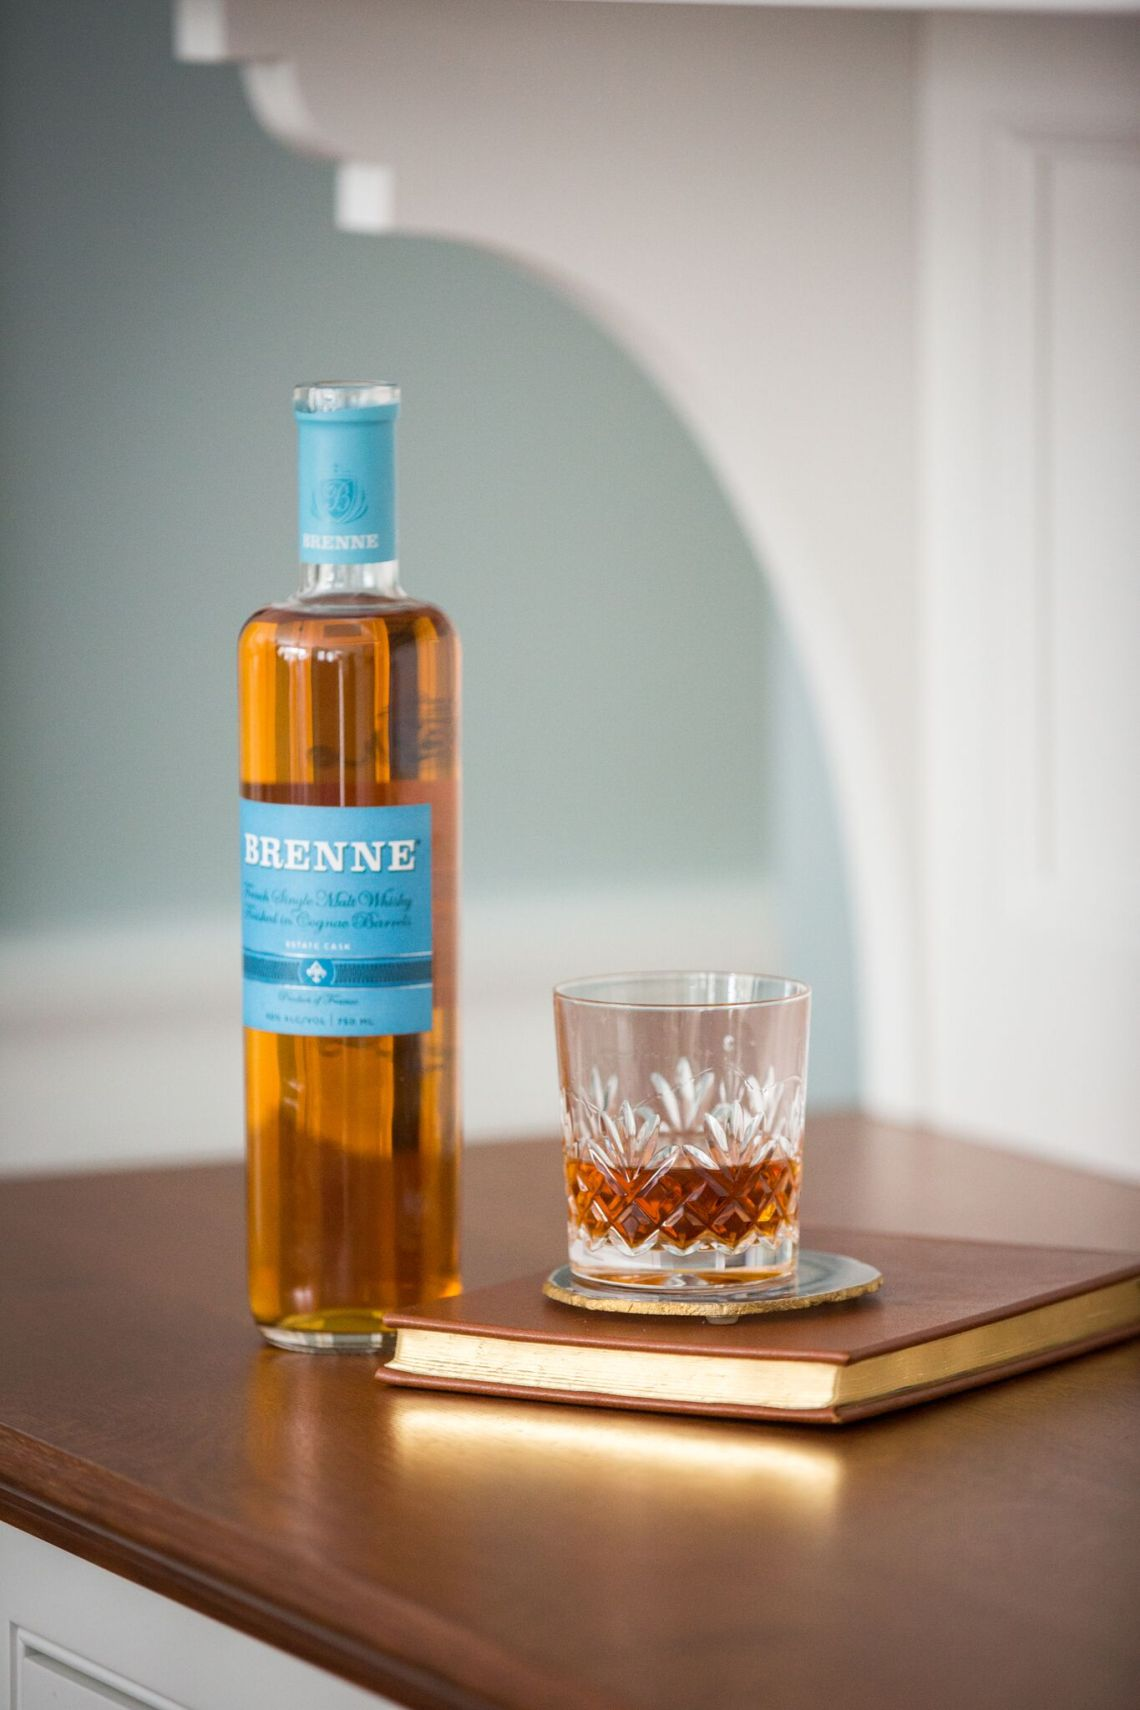 Brenne Ten French Single Malt Whiskey